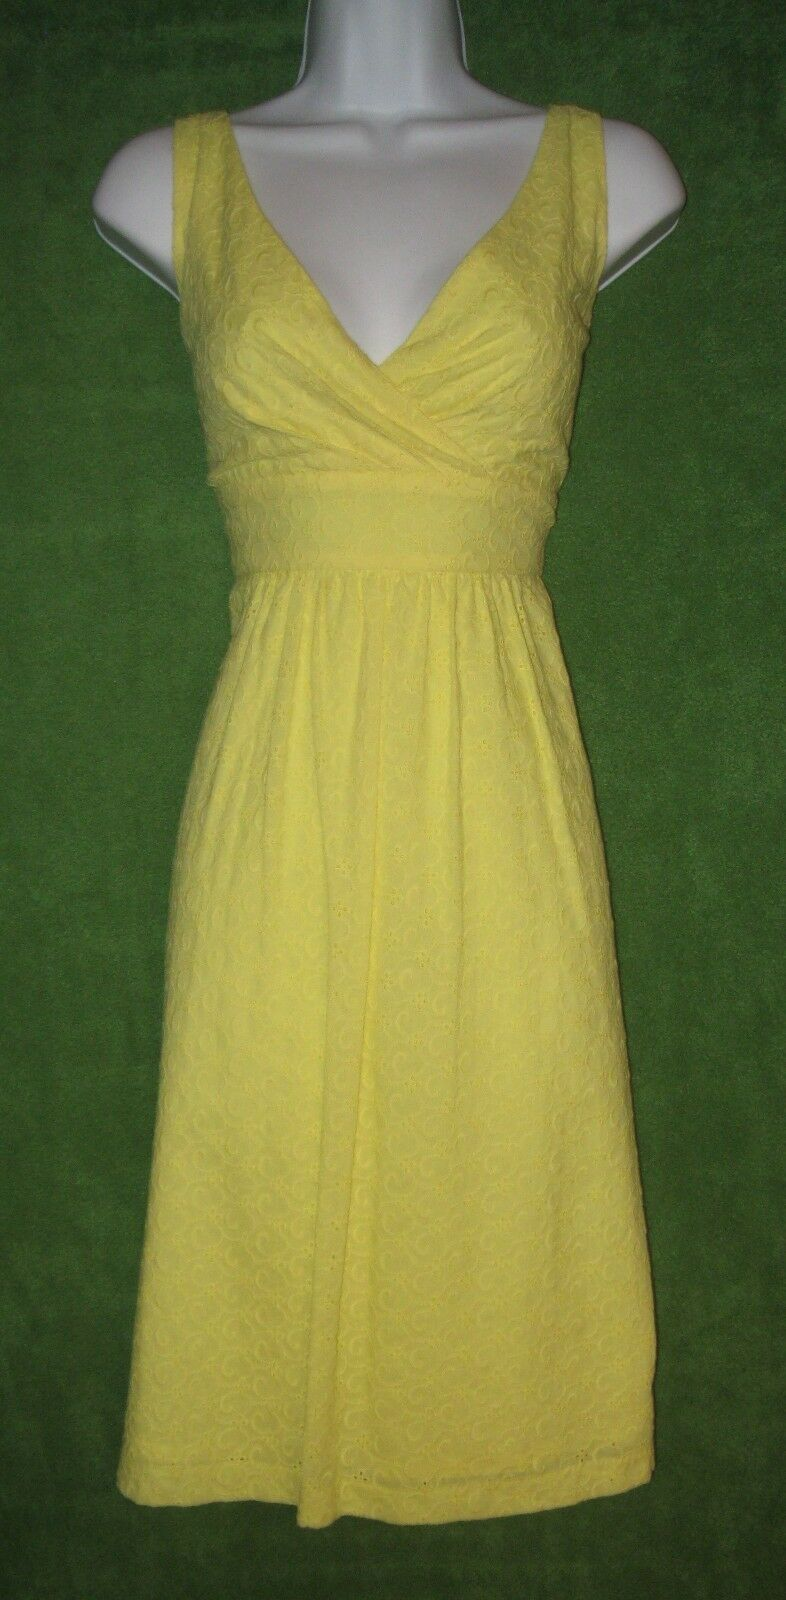 Chaps by Ralph Lauren Yellow Cotton Eyelet Empire Social Tea Dress 10